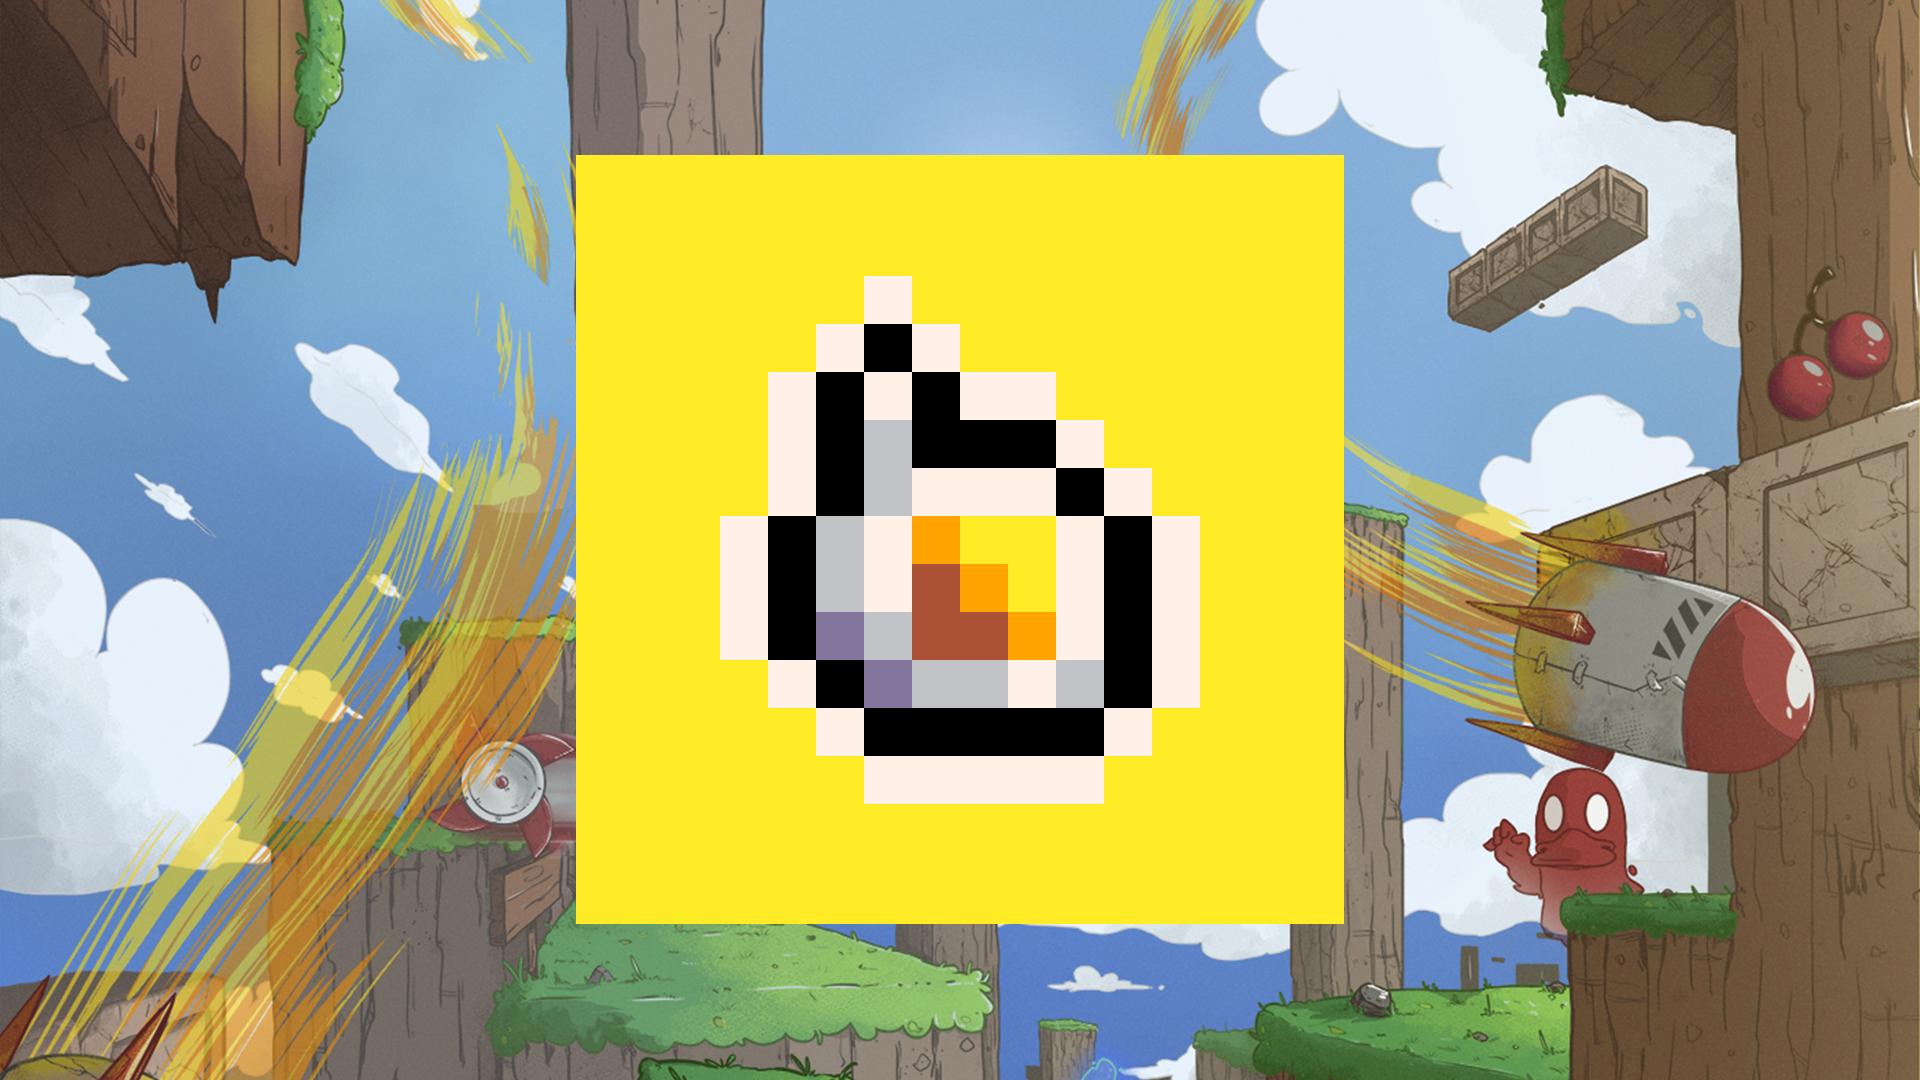 Icon for Space helmet